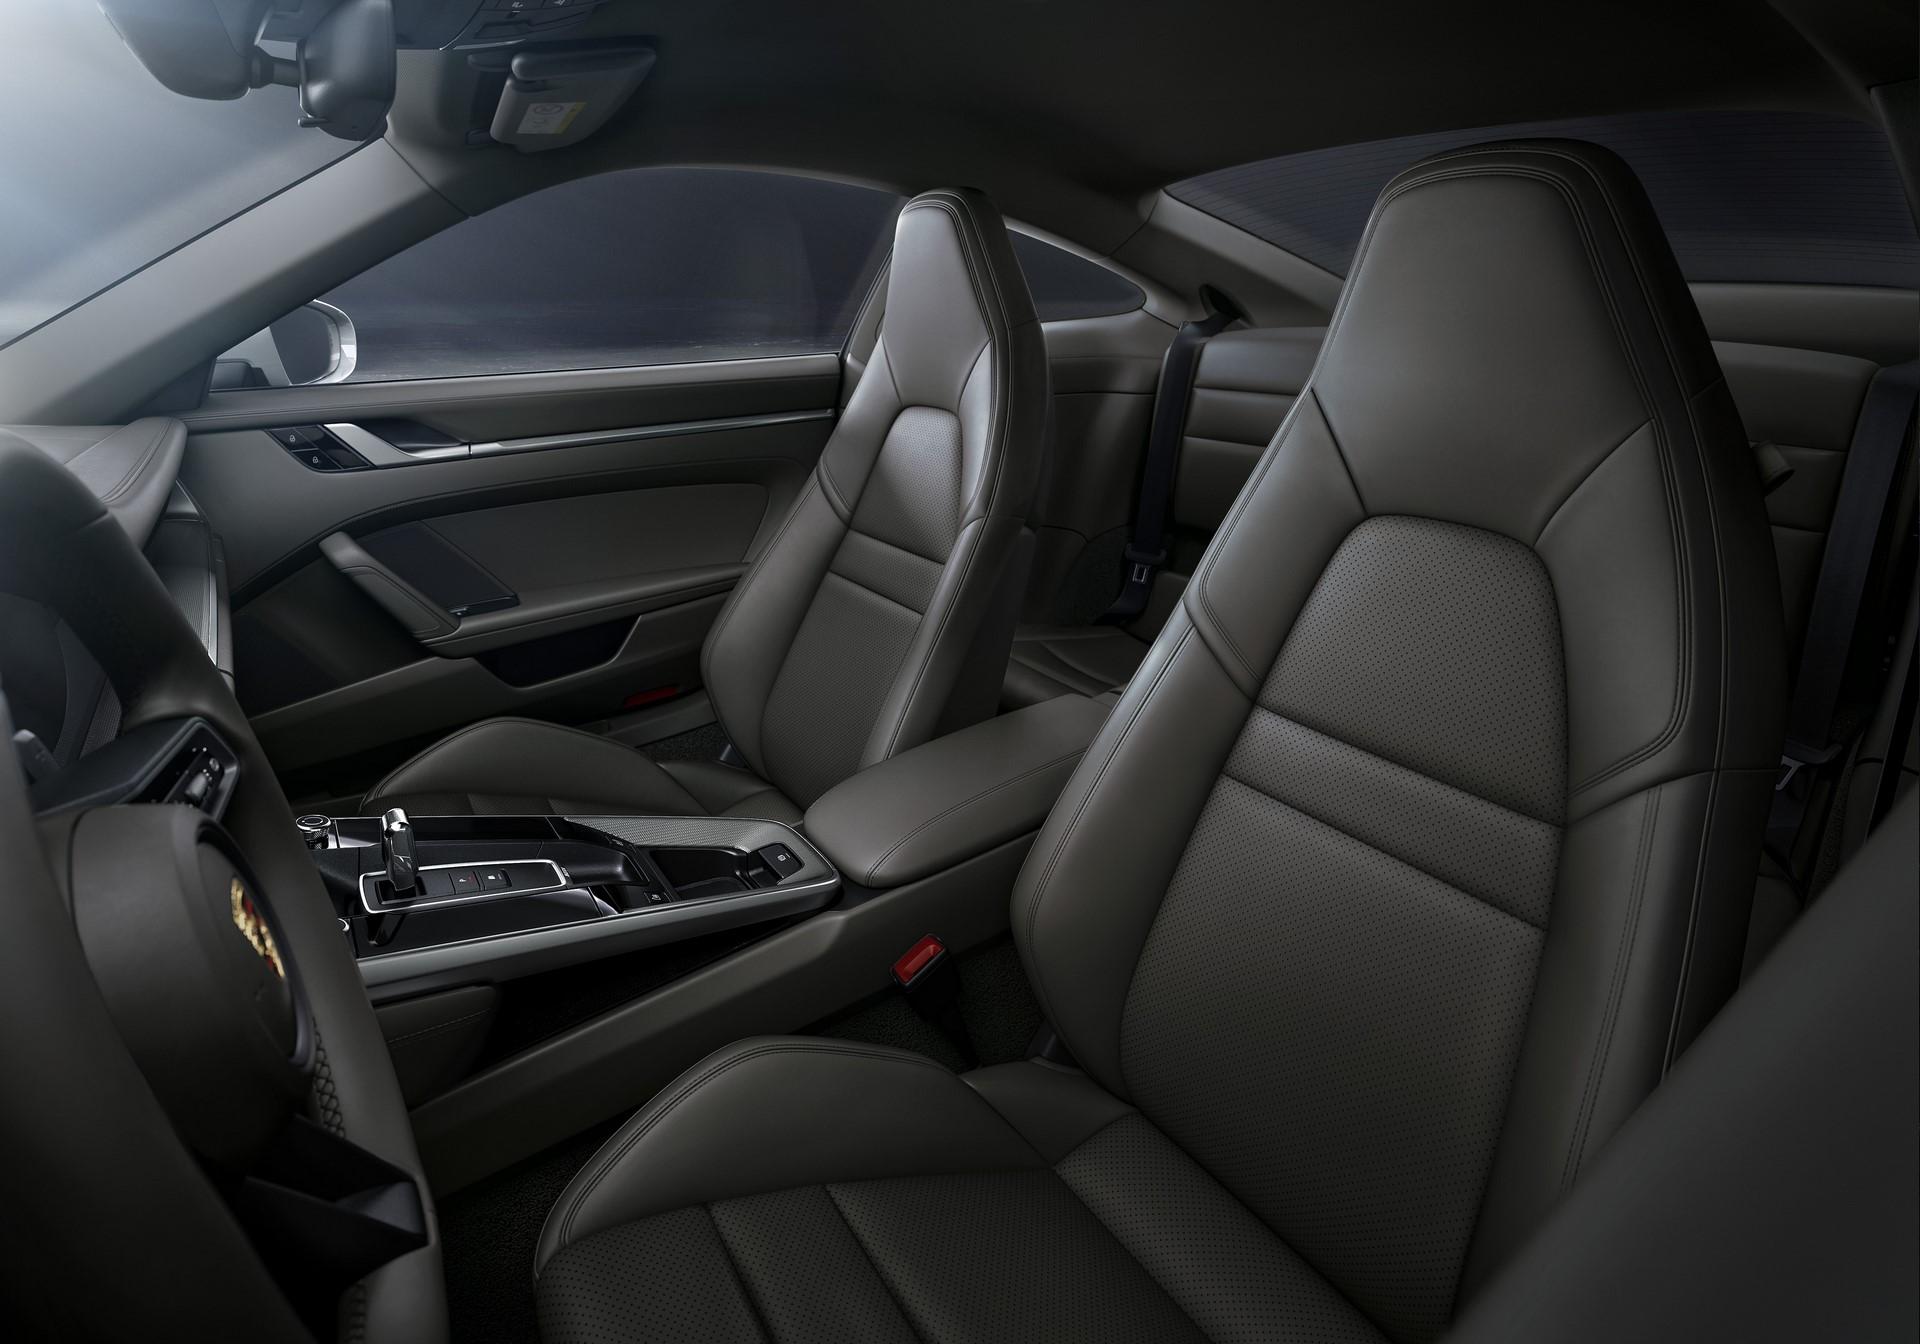 Porsche-911-Carrera-4-Coupe-and-Cabriolet-2020-5